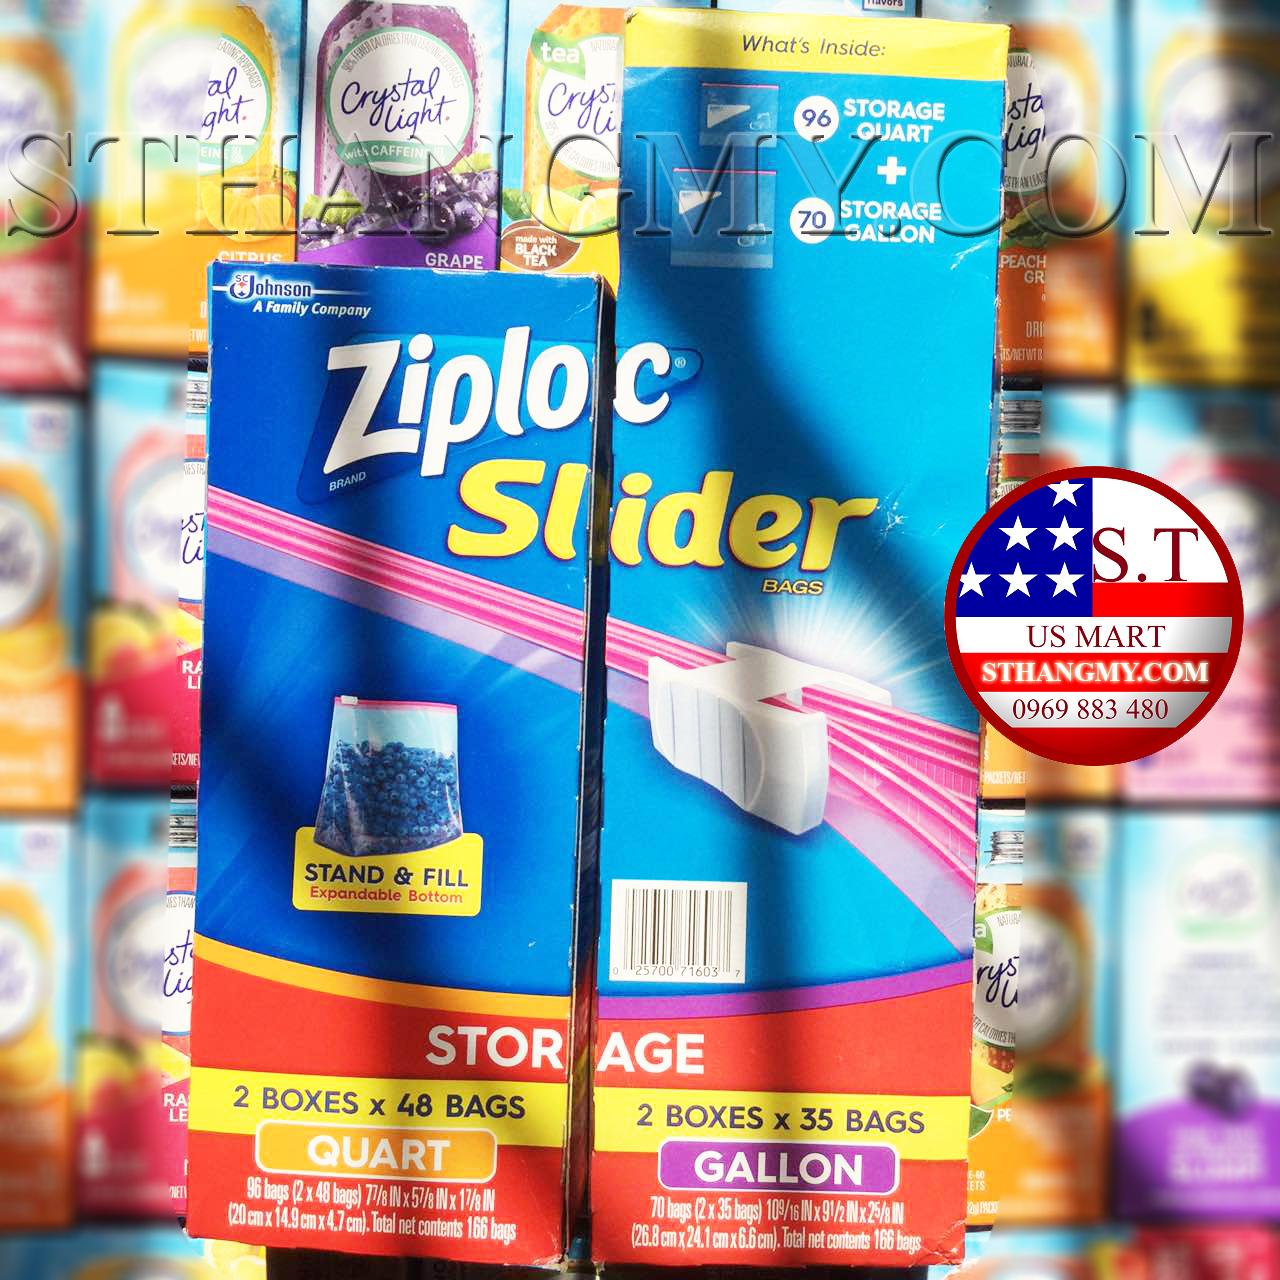 Hộp 48 Túi Zip có khóa kéo size vừa- Ziploc Slider Storeage Bags Quart